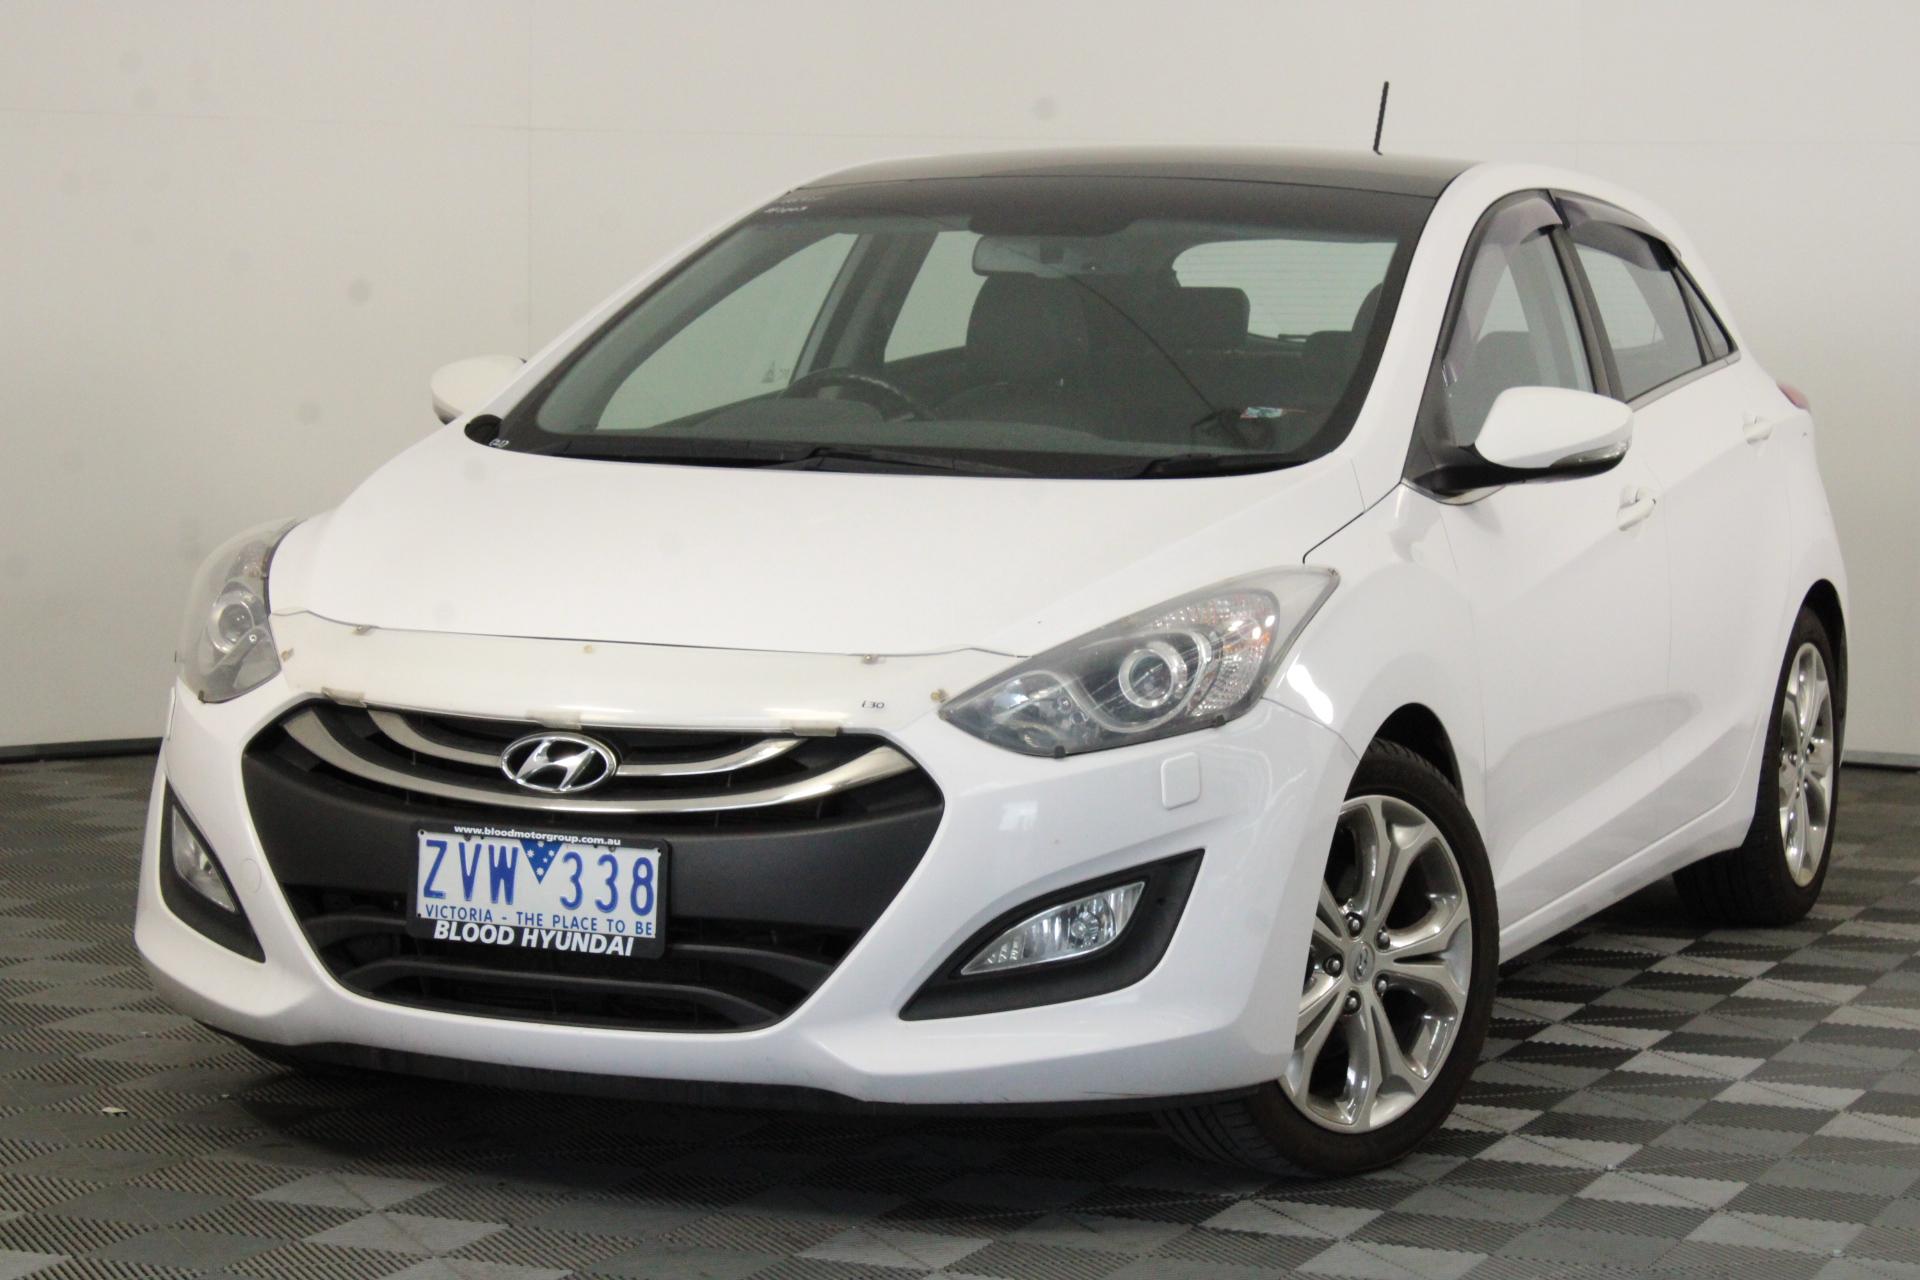 2013 Hyundai i30 Premium GD Automatic Hatchback